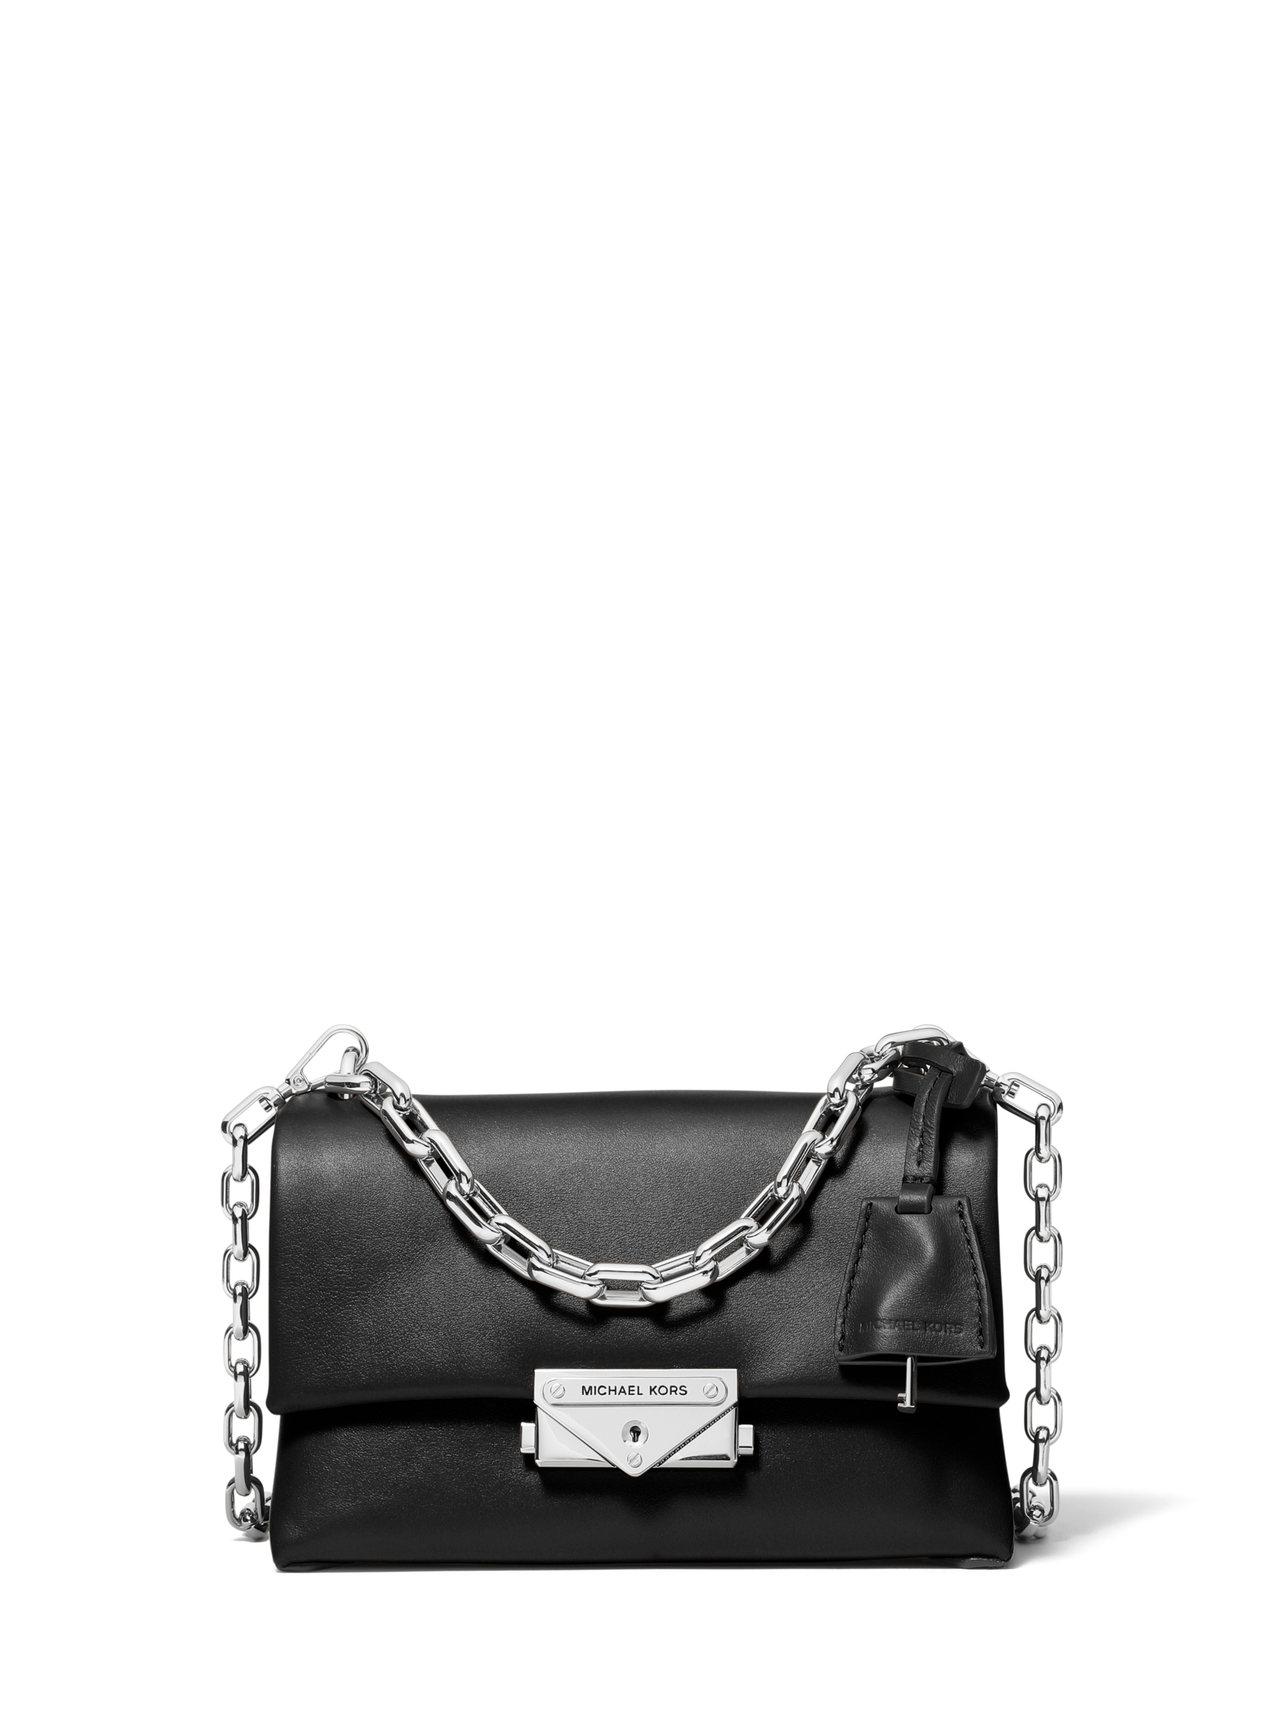 CECE黑色鍊帶小包,售價13,200元。圖/MICHAEL KORS提供